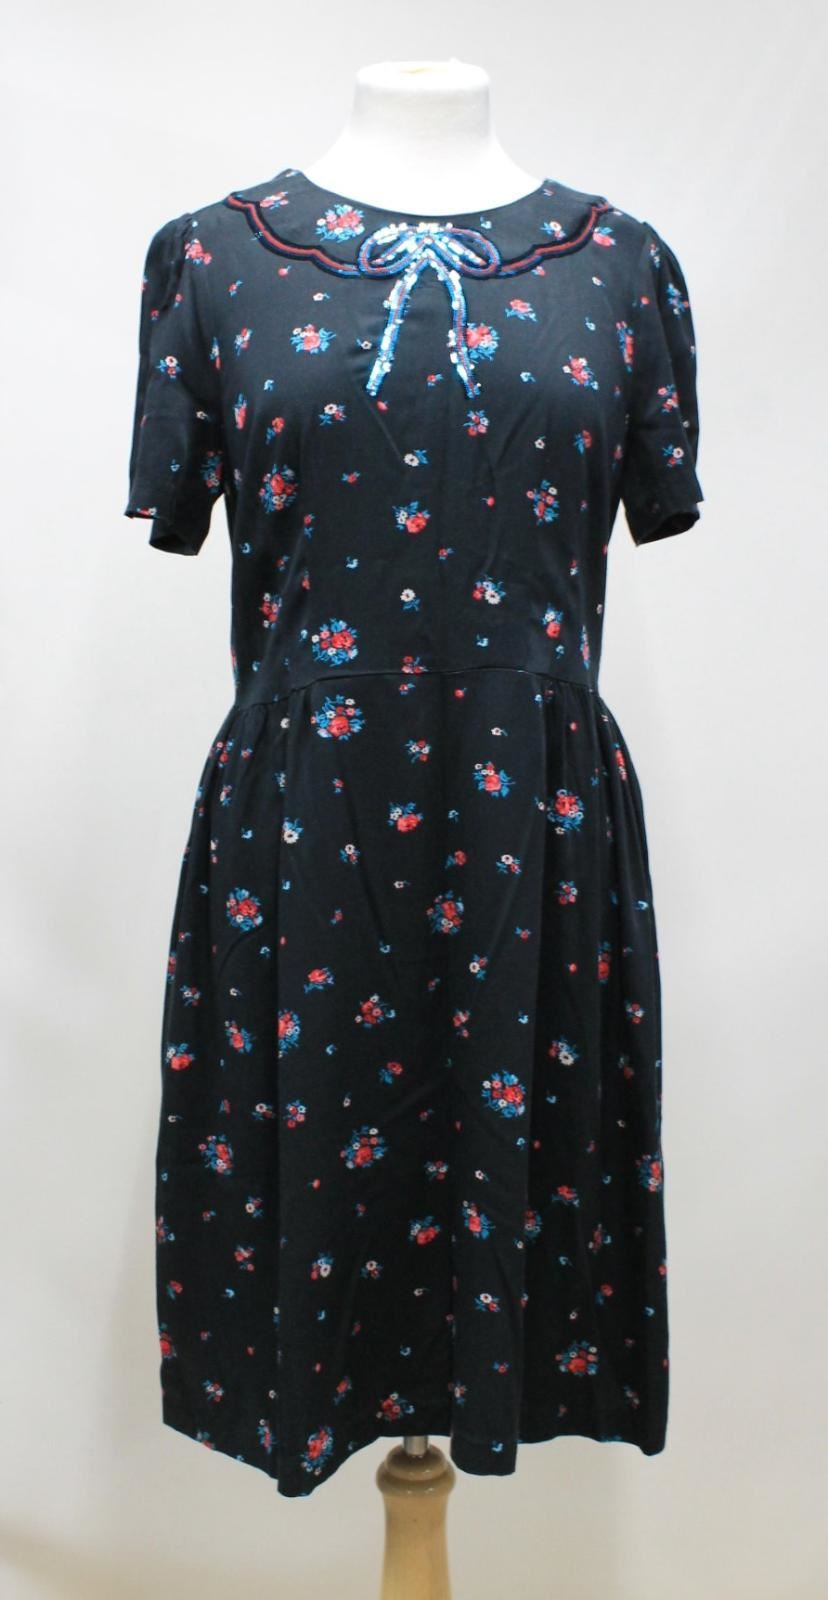 BNWT CATH KIDSTON Ladies Charcoal grau Sequin Detail Rosa Print Shift Dress UK8